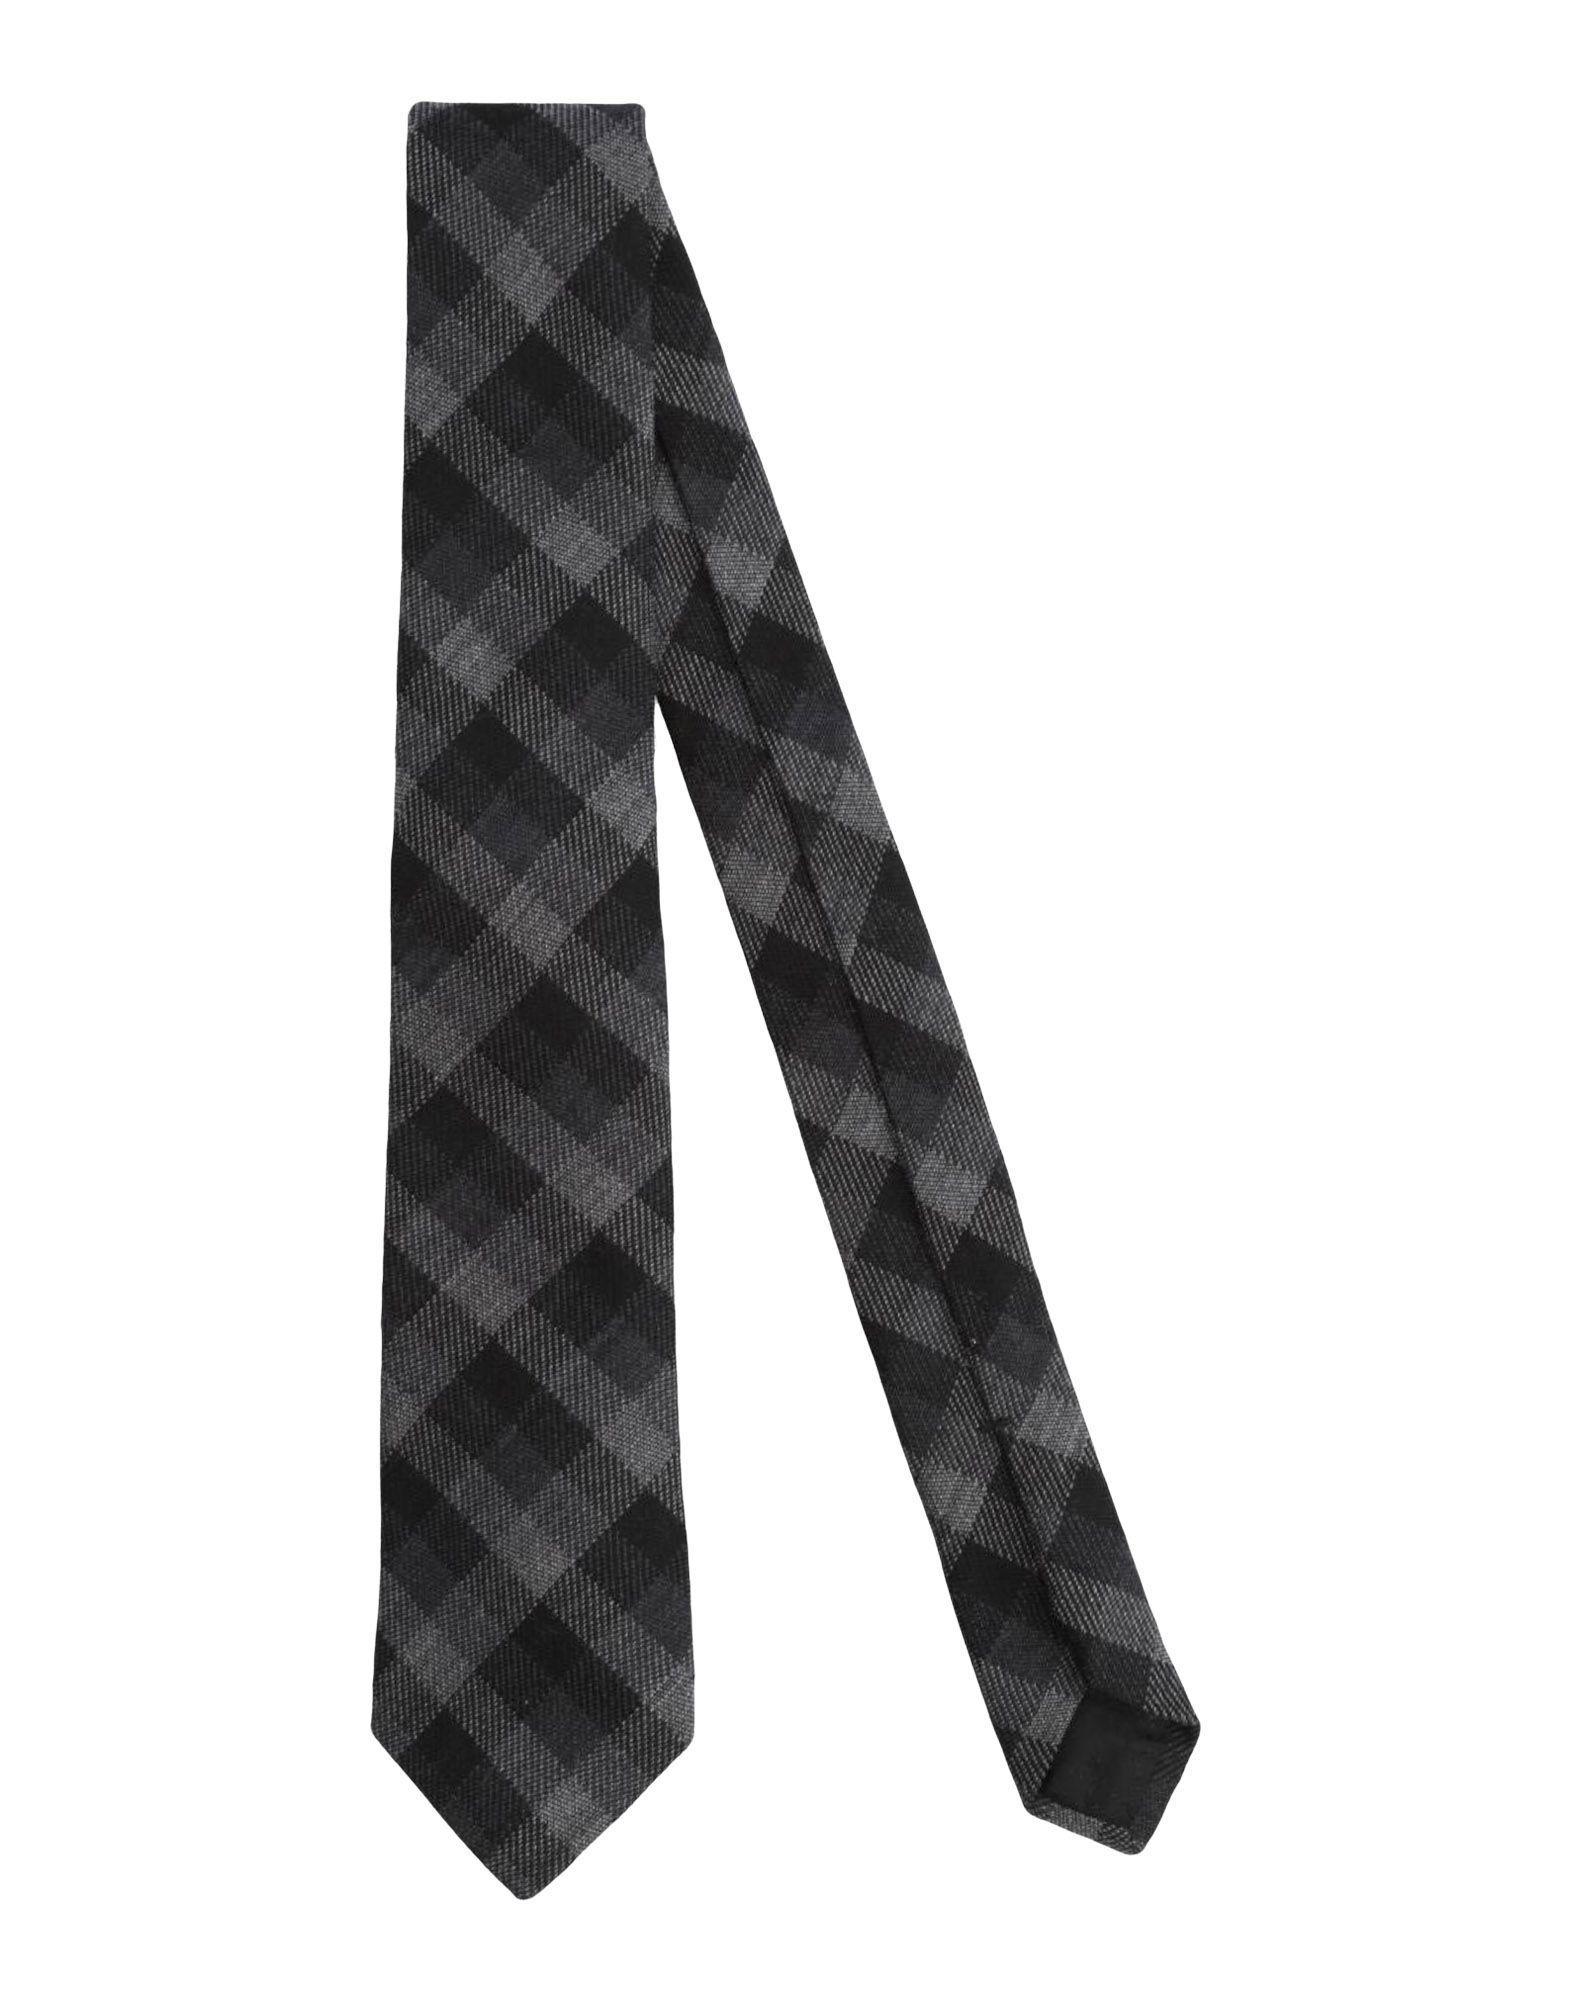 Gucci Tie In Steel Grey